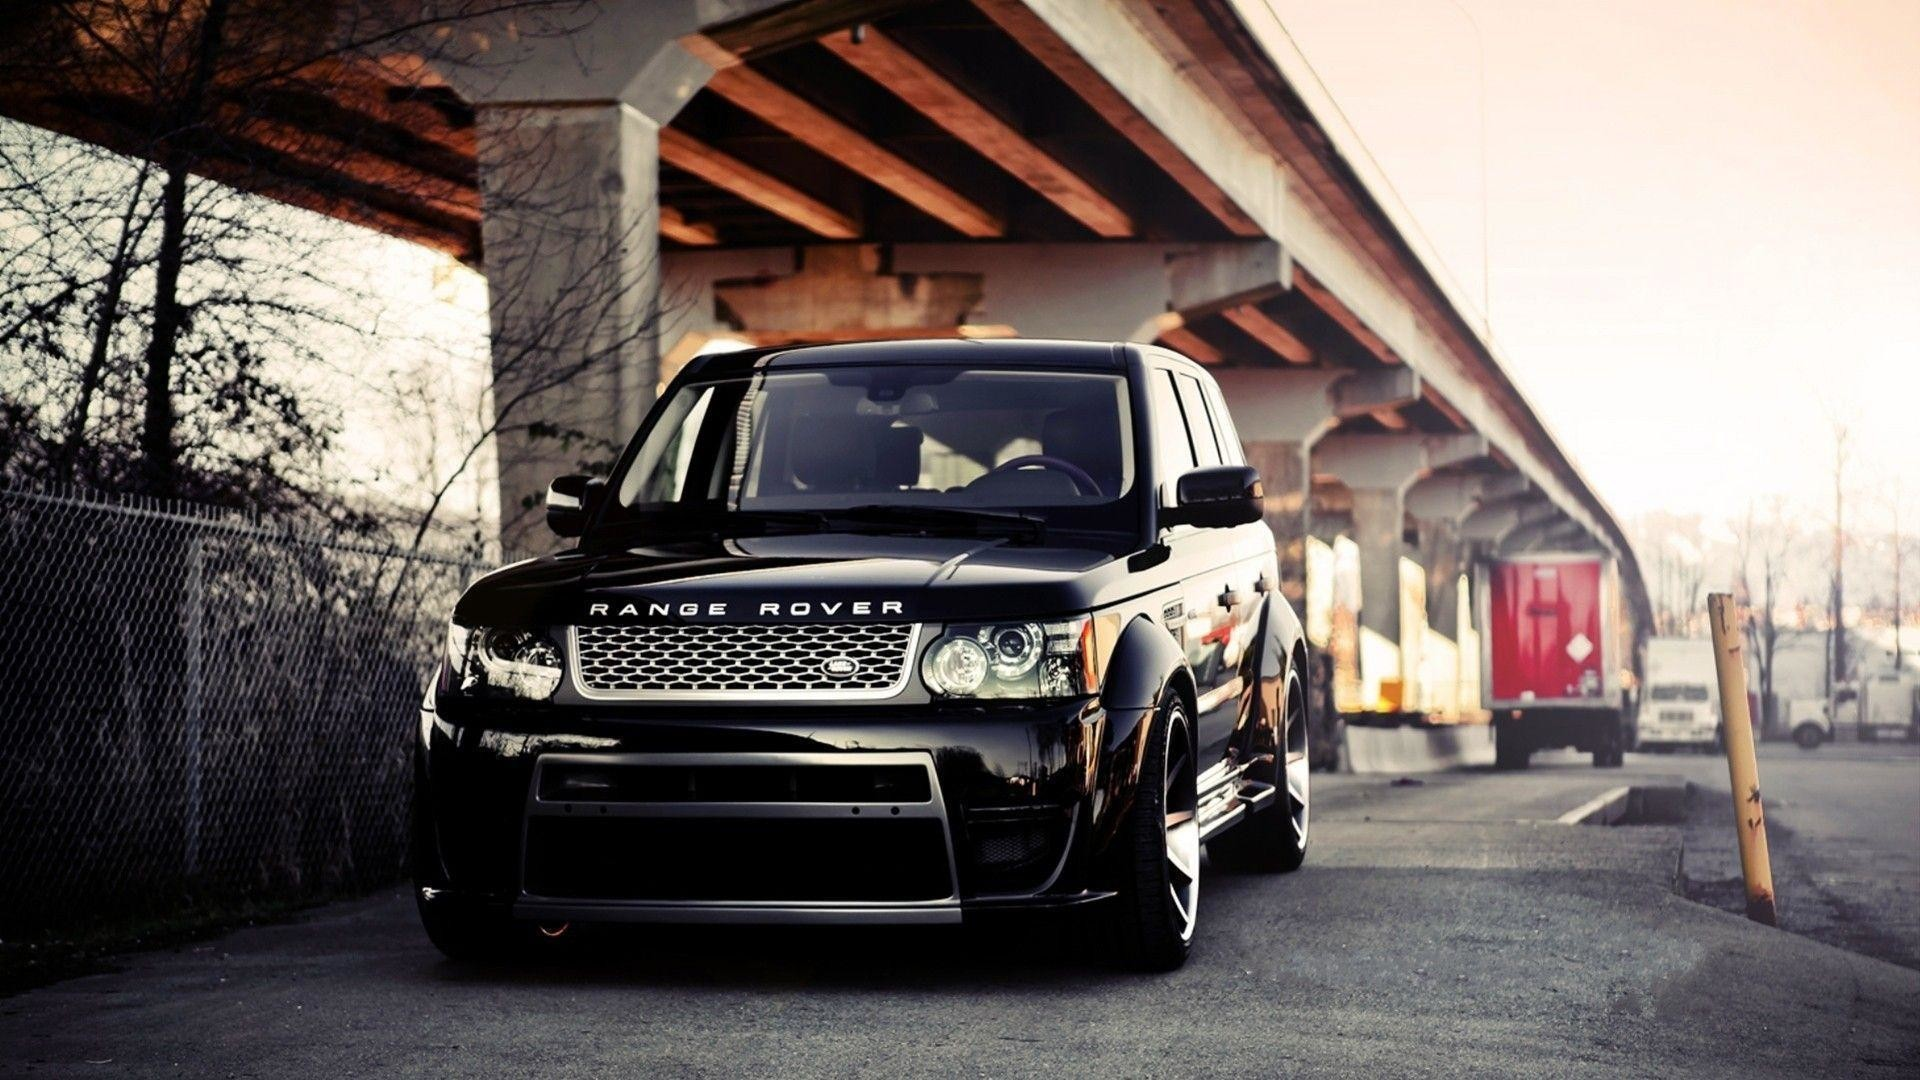 Range Rover Sport 2018 Desktop Wallpaper 1600x1200 14 Images